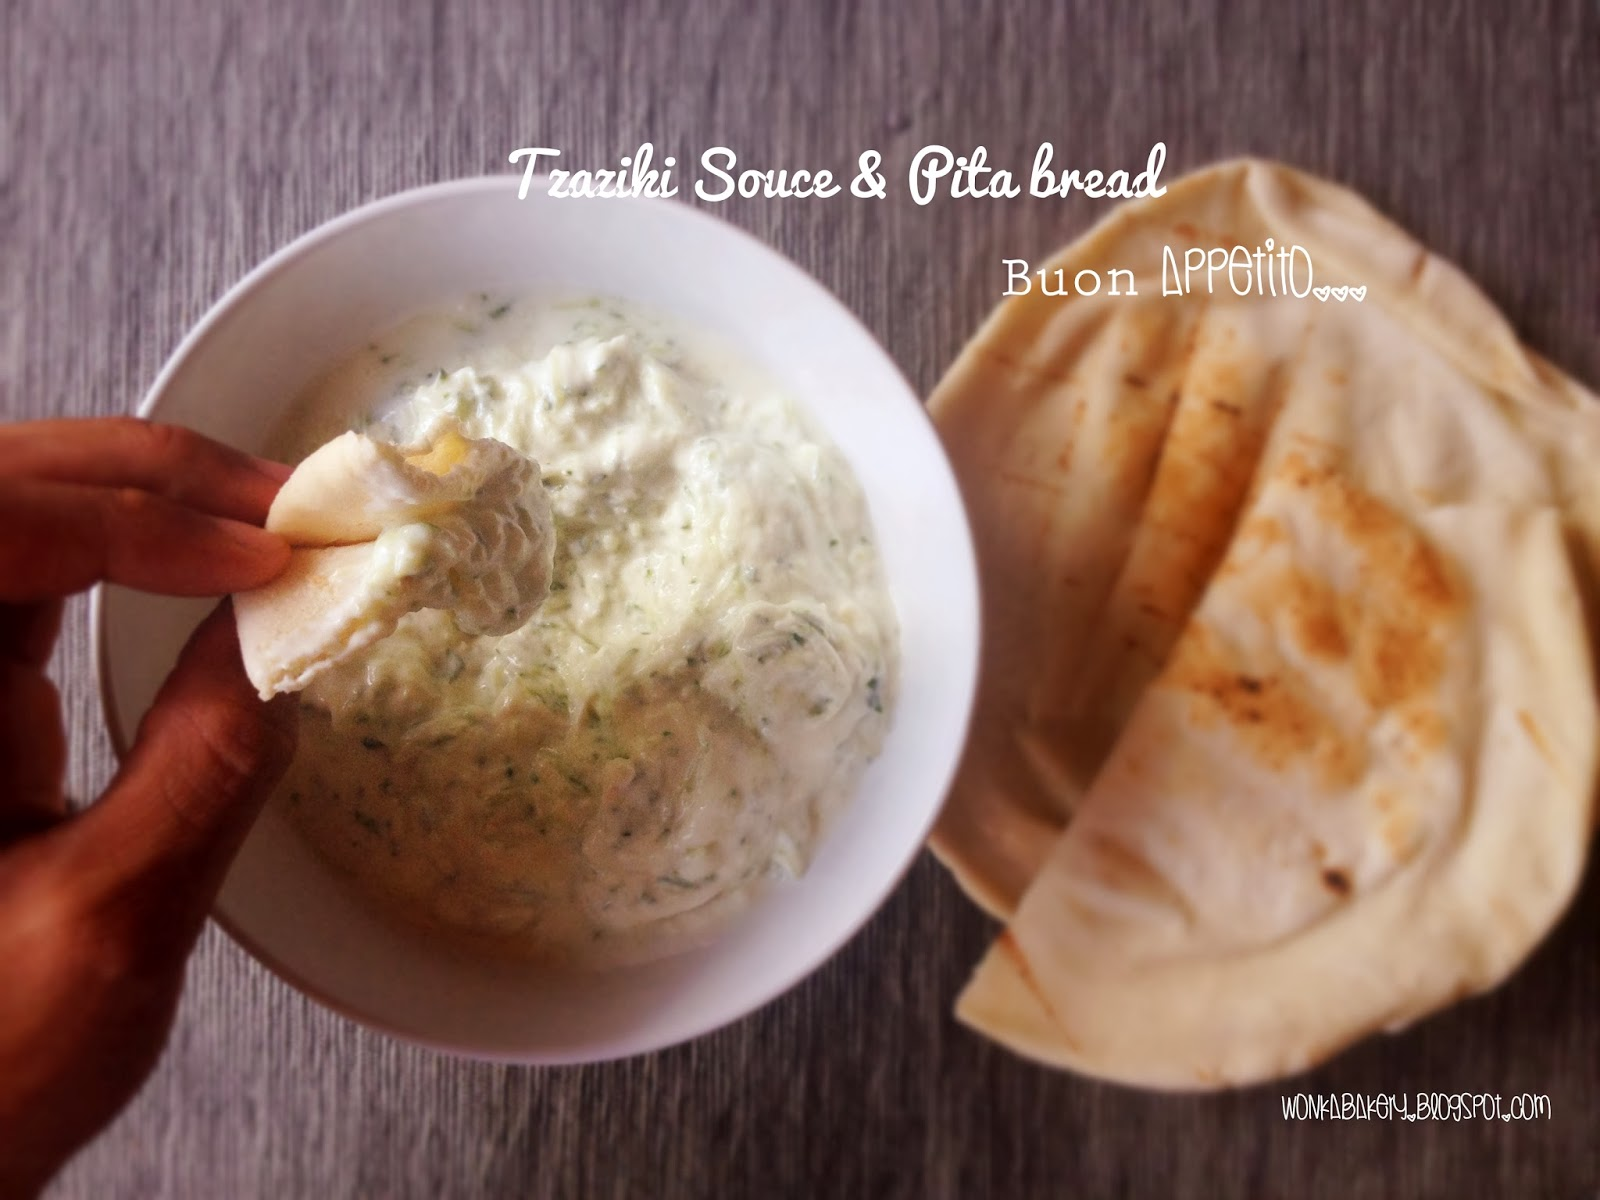 tzaziki & pita bread